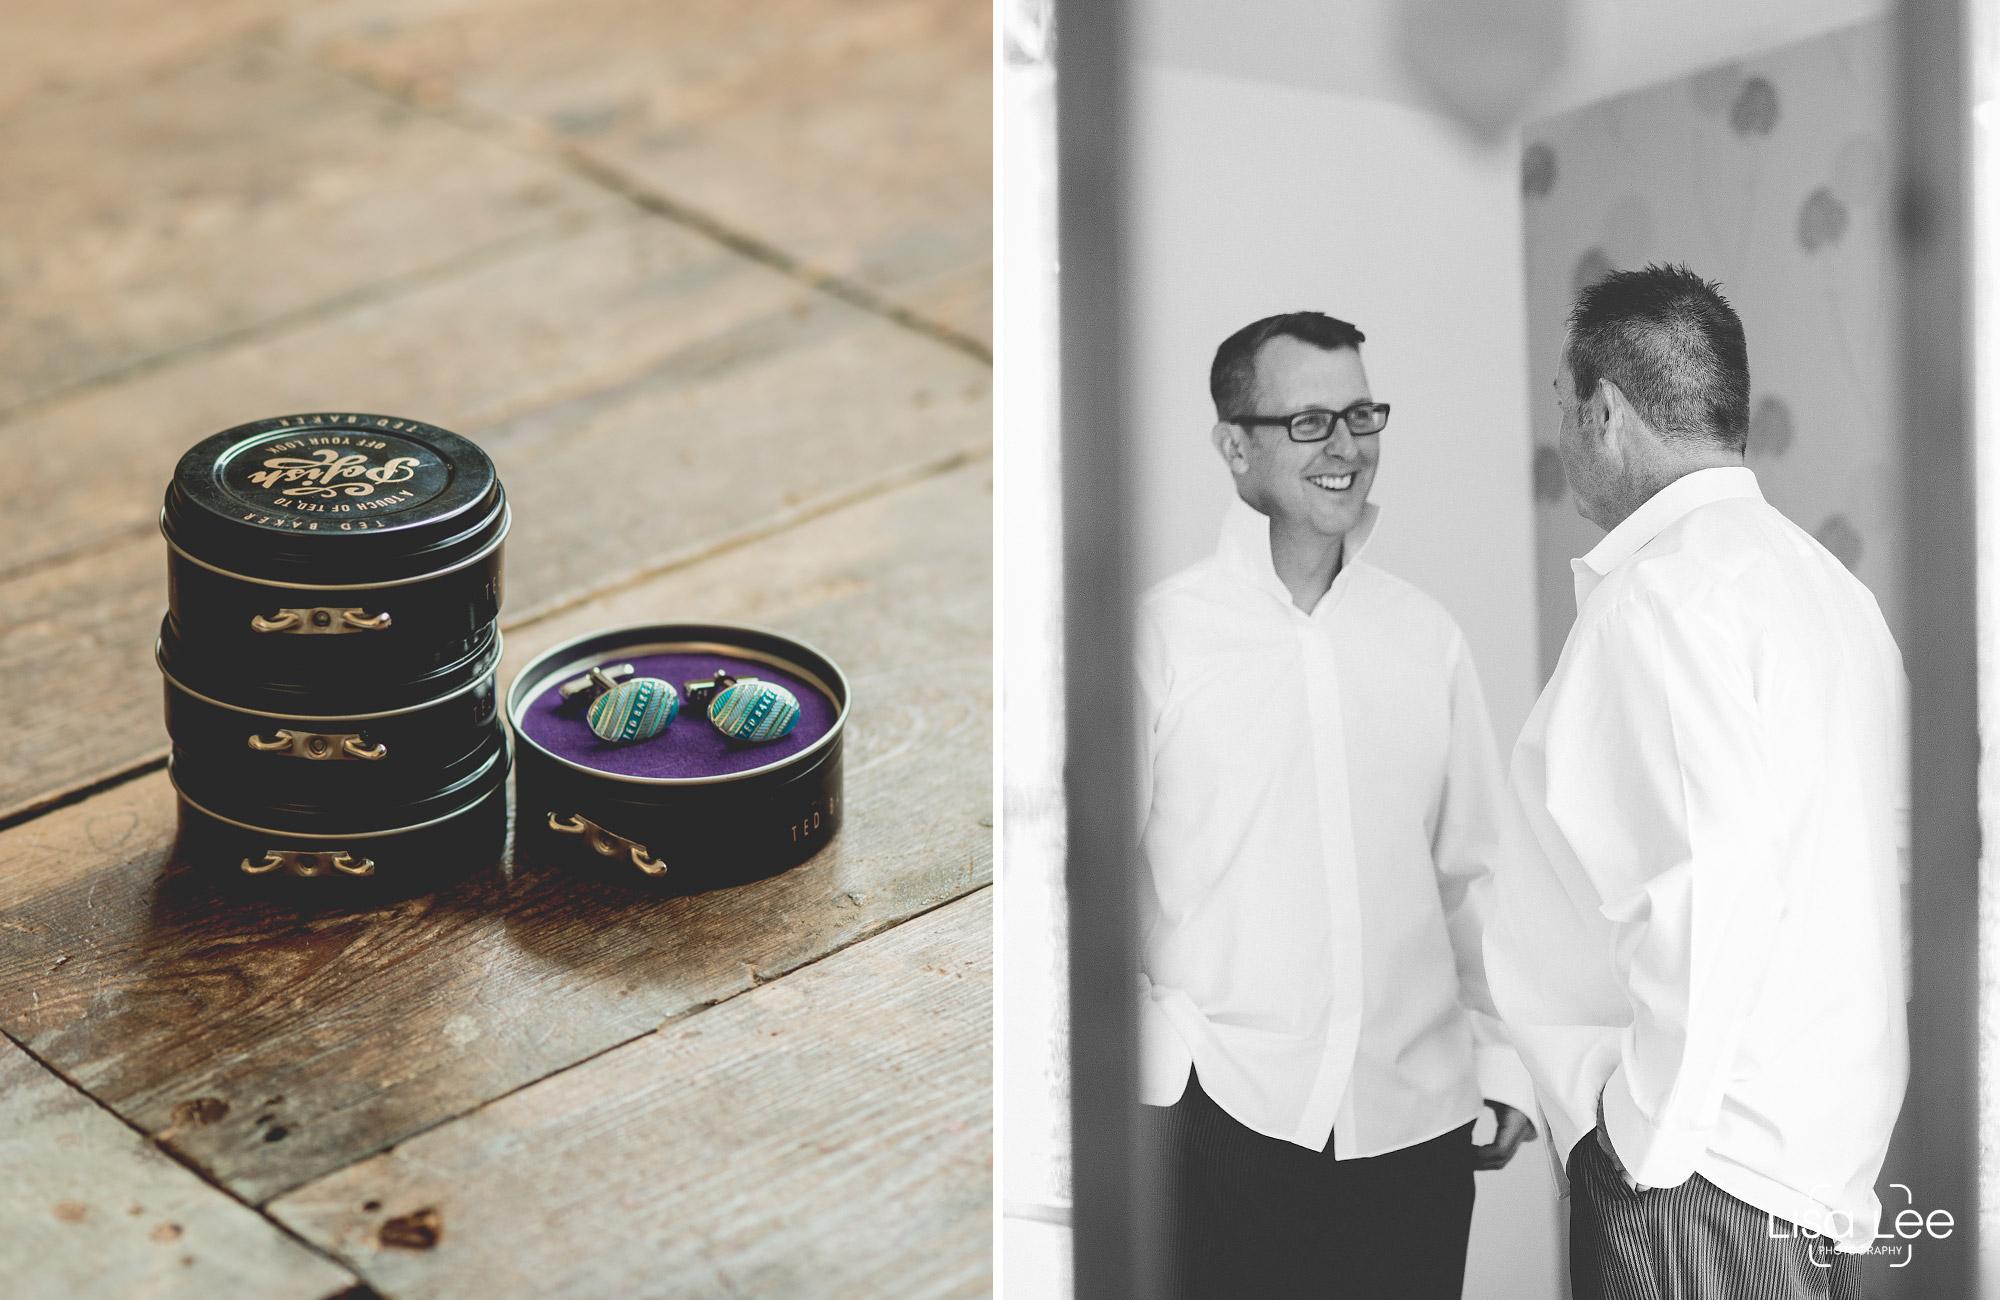 lisa-lee-wedding-photography-burton-bestmen1.jpg